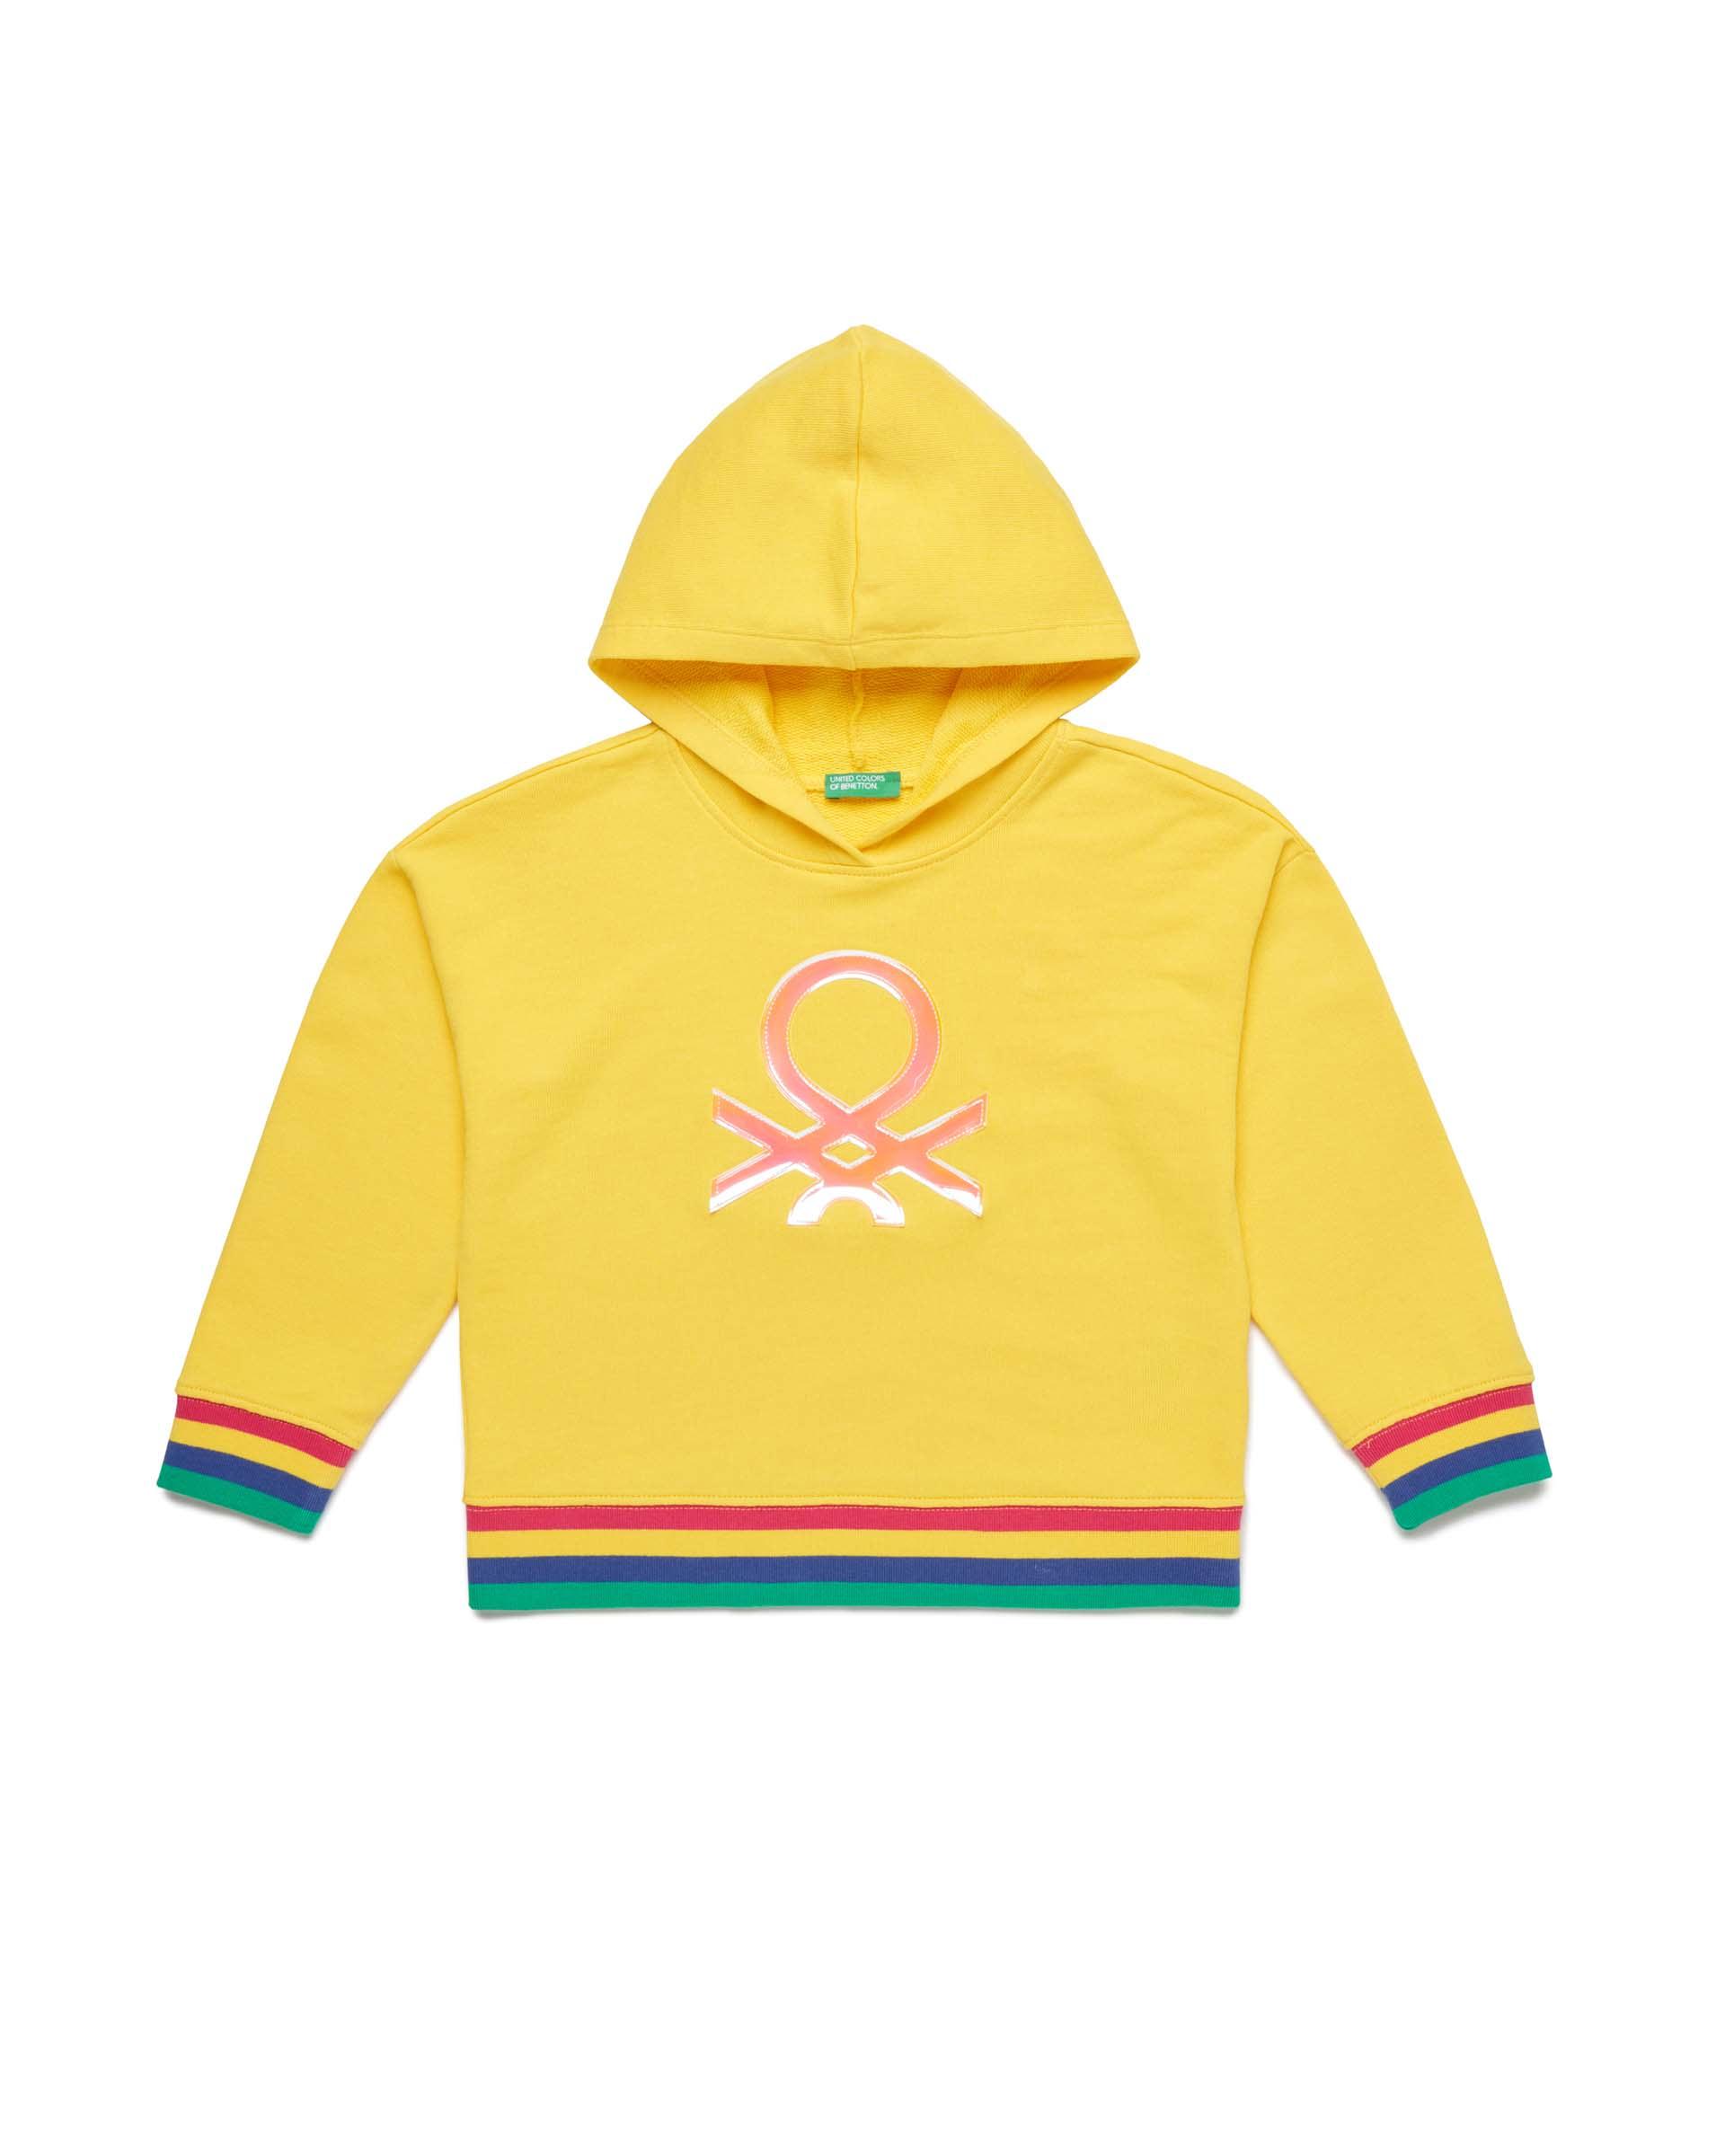 Купить 20P_3J68C2175_3N7, Толстовка для девочек Benetton 3J68C2175_3N7 р-р 104, United Colors of Benetton, Толстовки для девочек